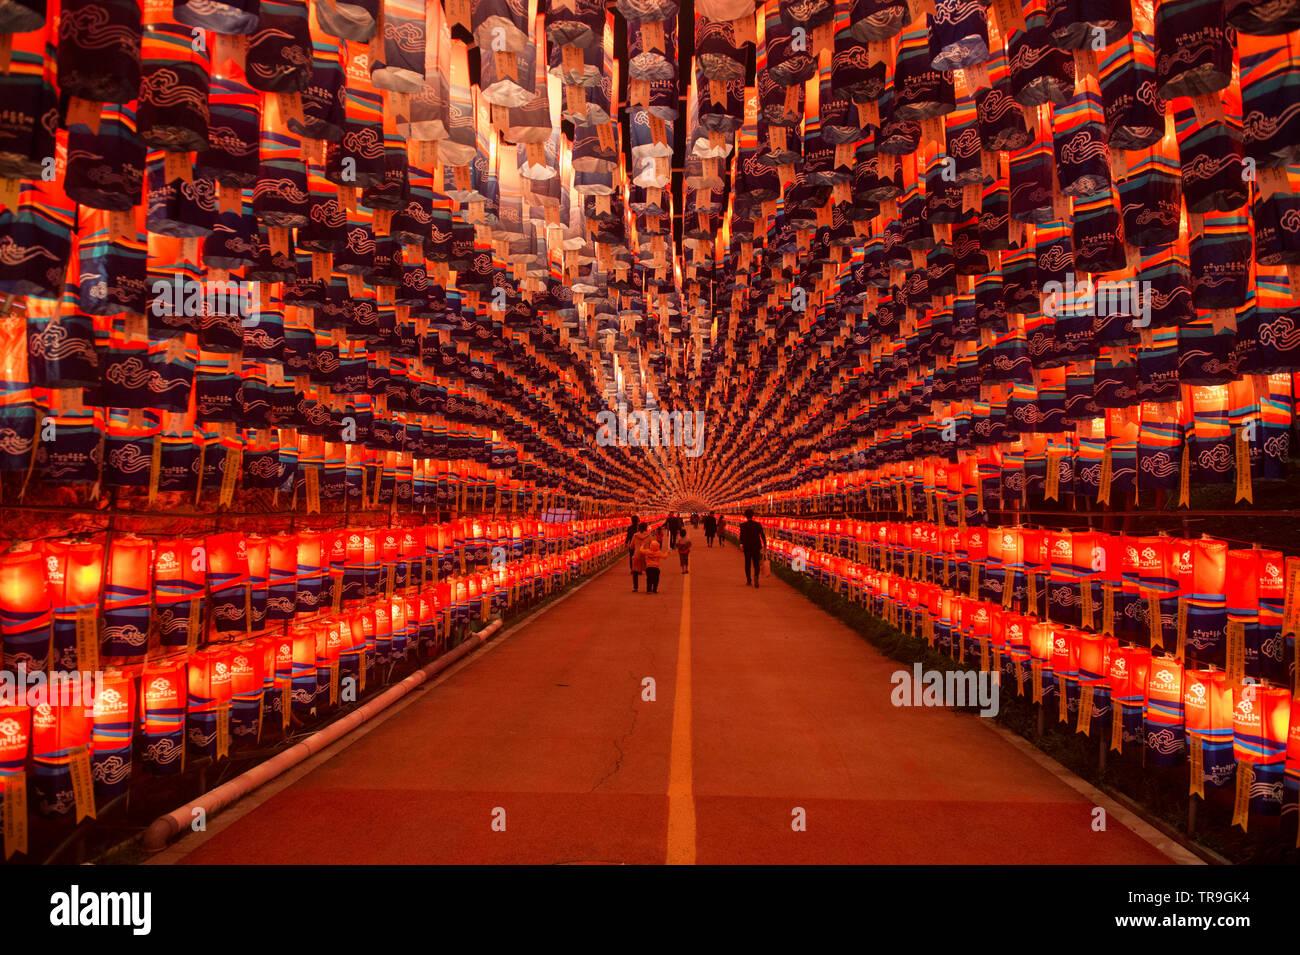 Tunnel Of Lanterns During The Jinju Lantern Festival In Jinju South Korea Stock Photo Alamy